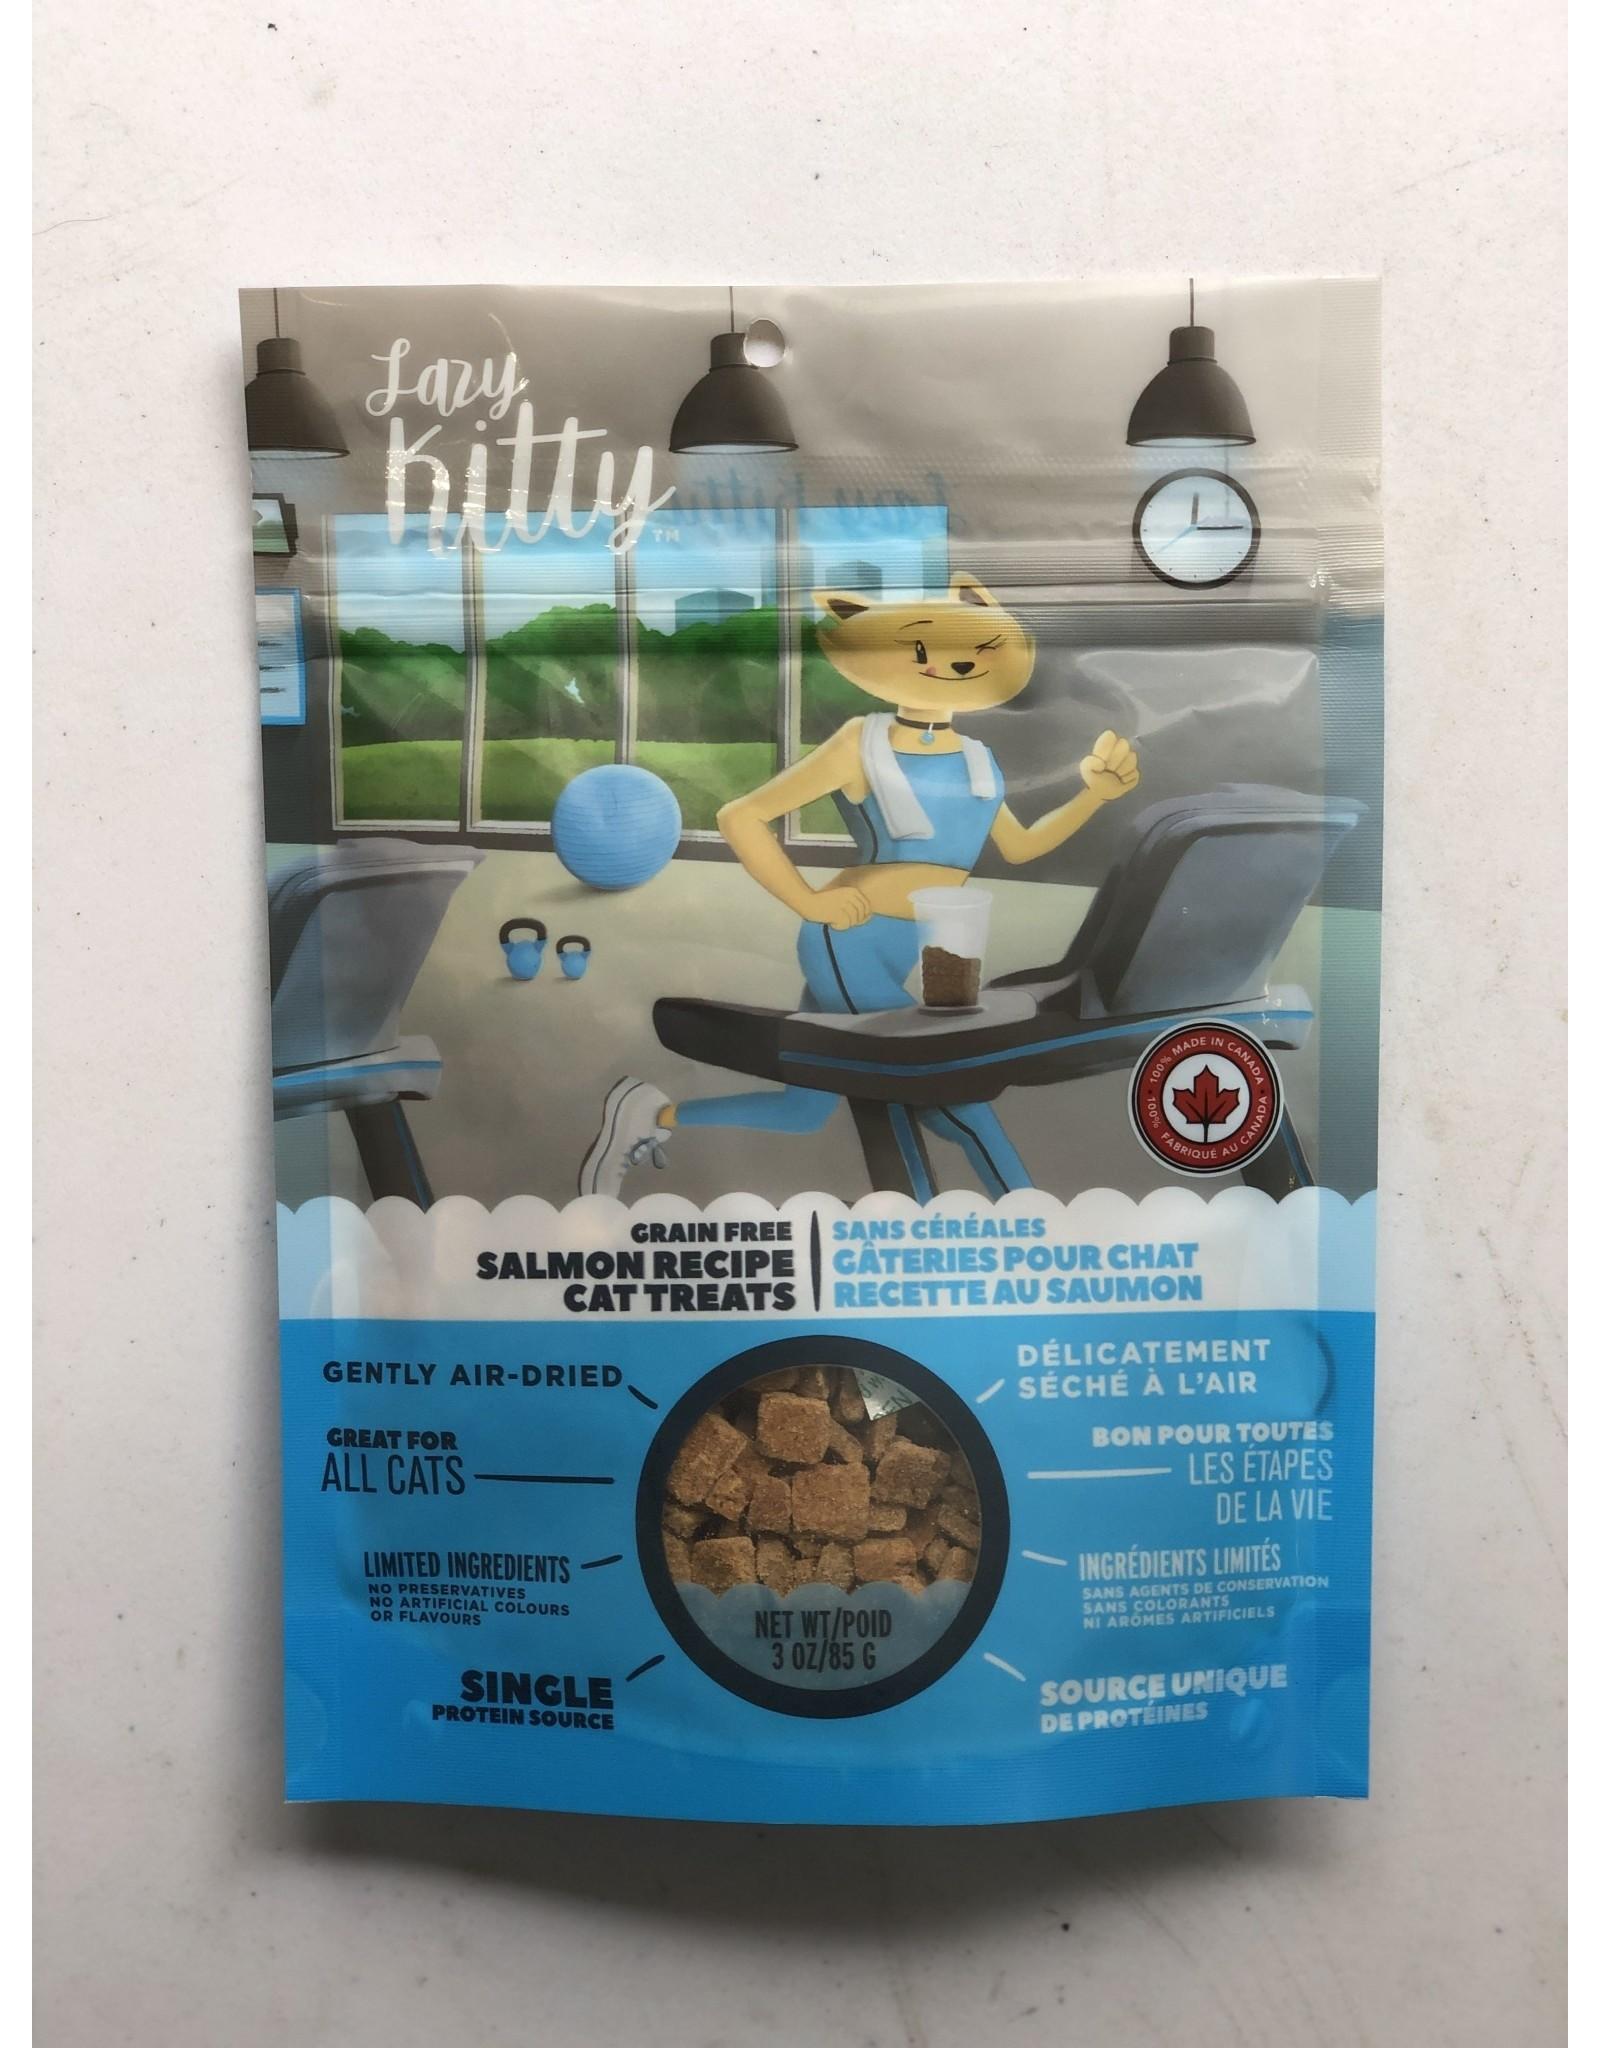 Lazy Kitty Air Dried Treat Slm 3oz/85g